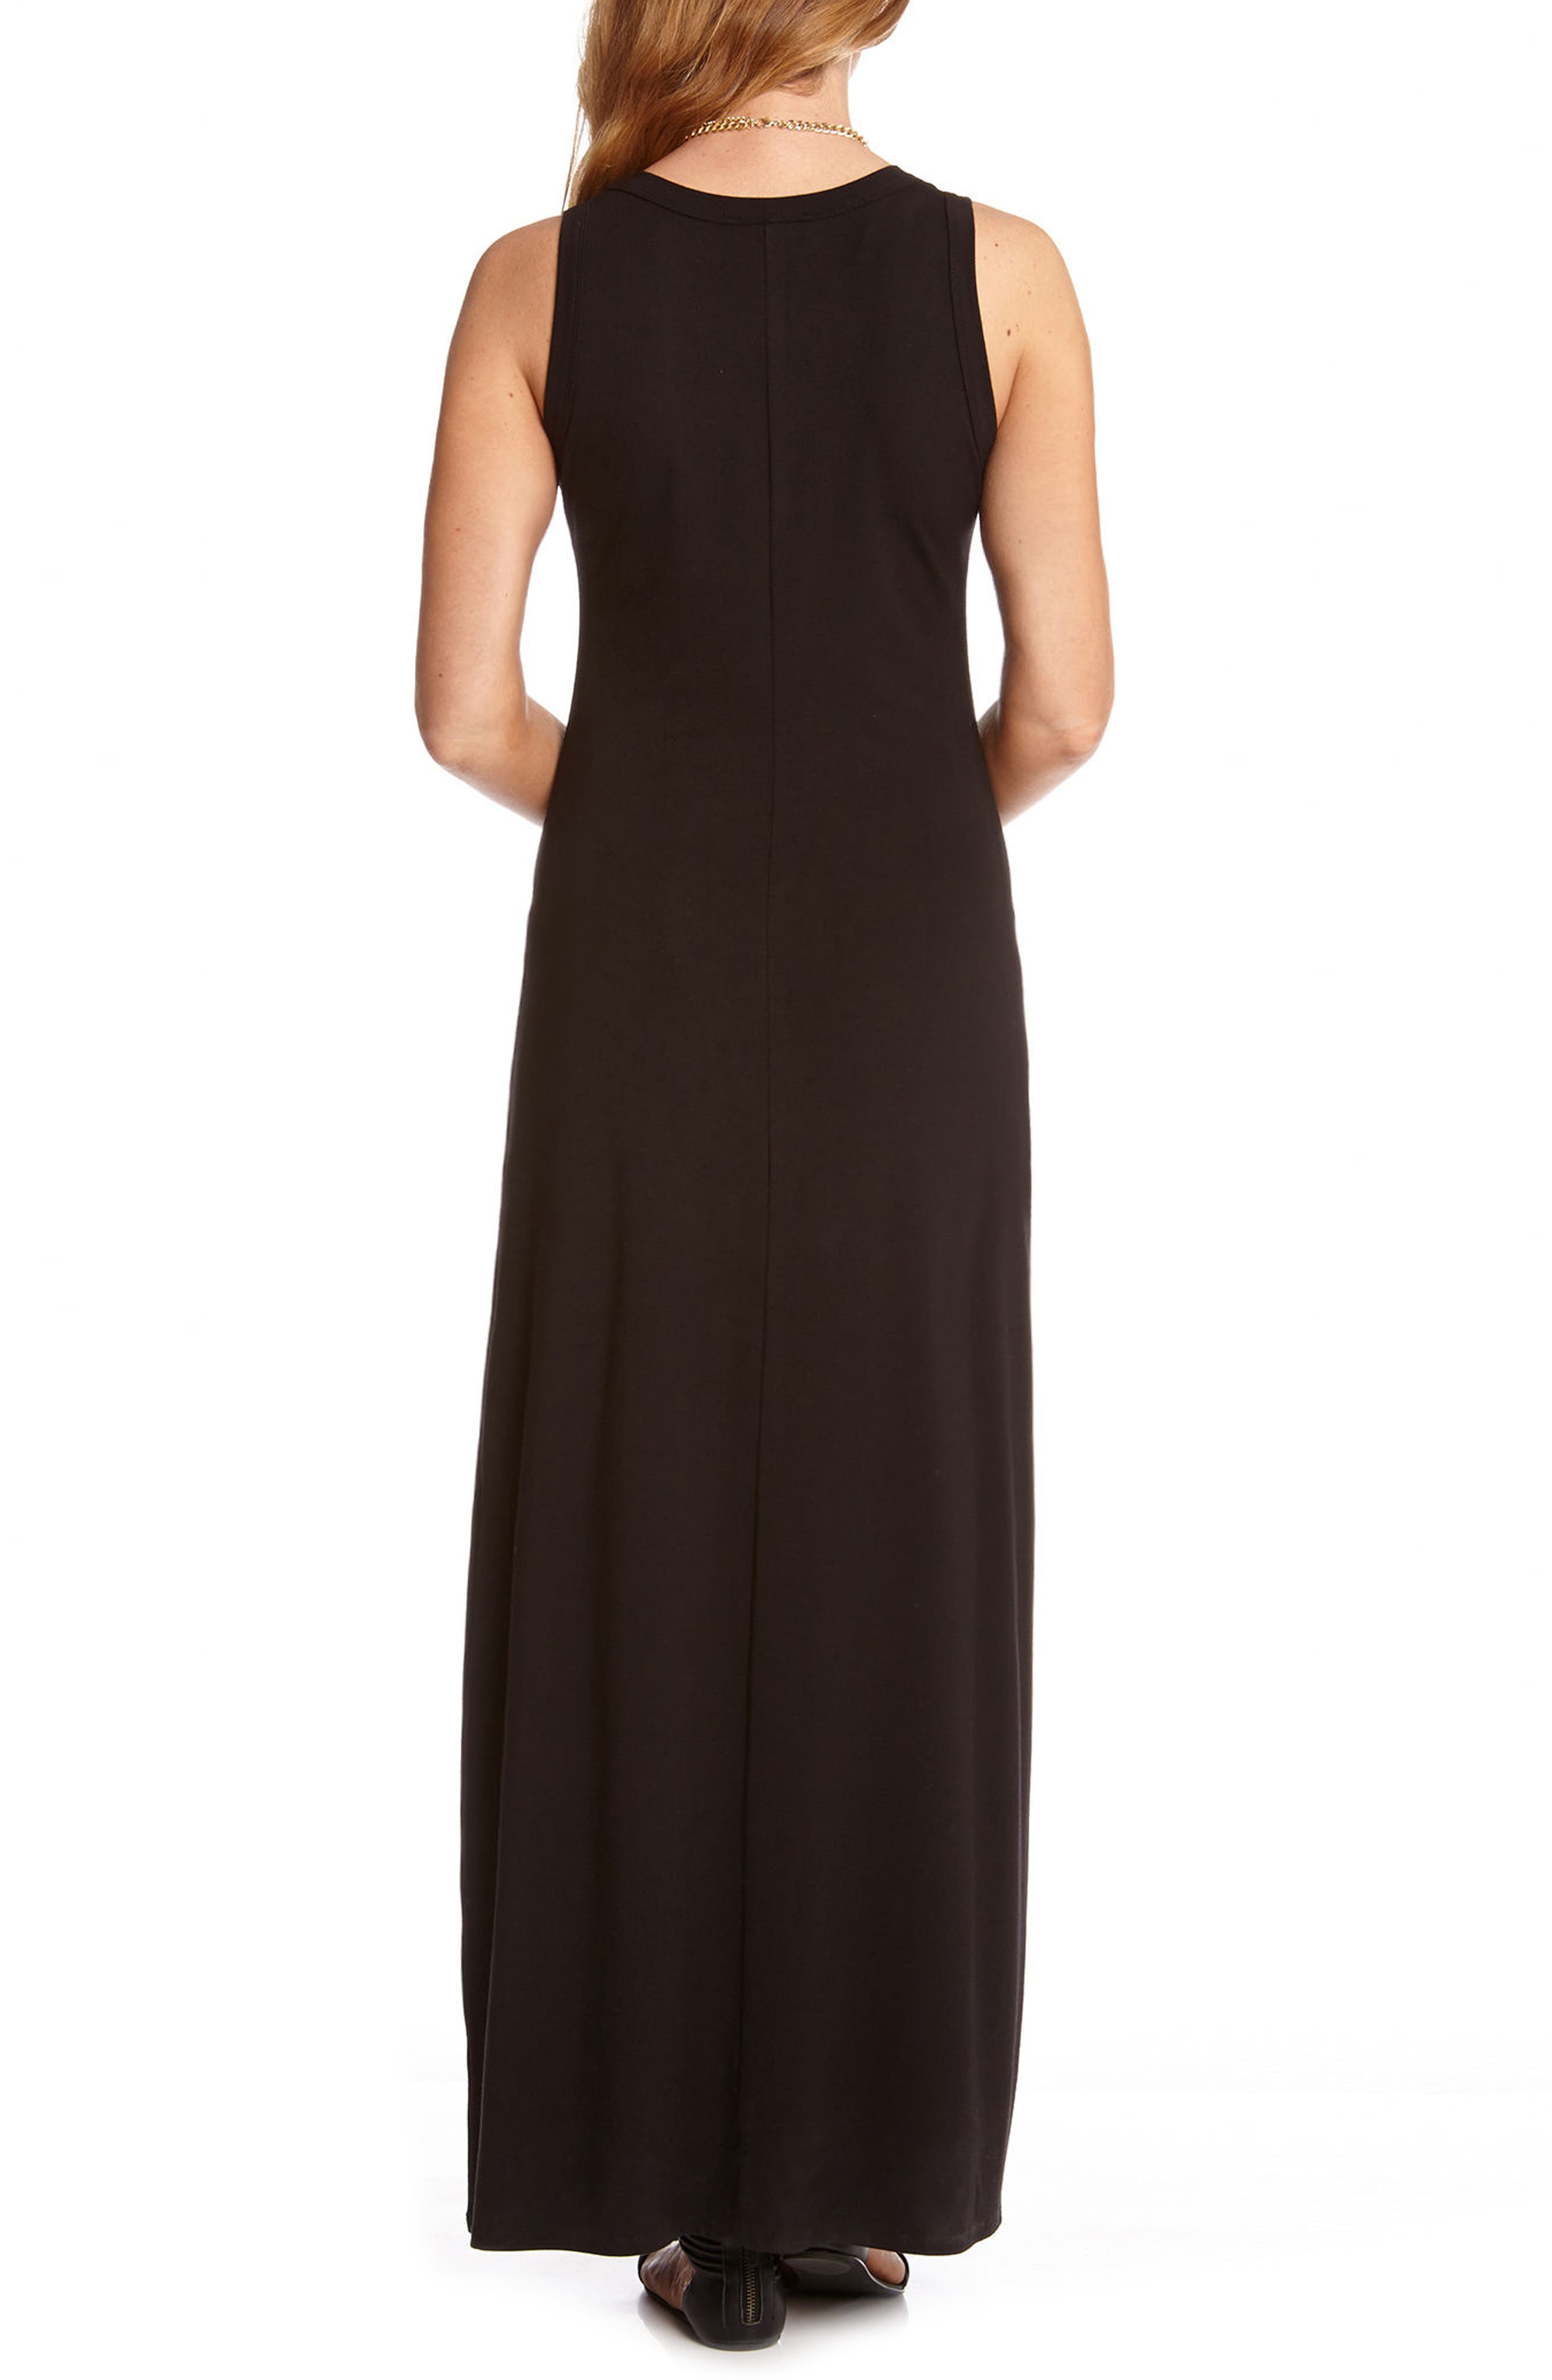 KAREN KANE, Maxi Tank Dress, Alternate thumbnail 2, color, BLACK